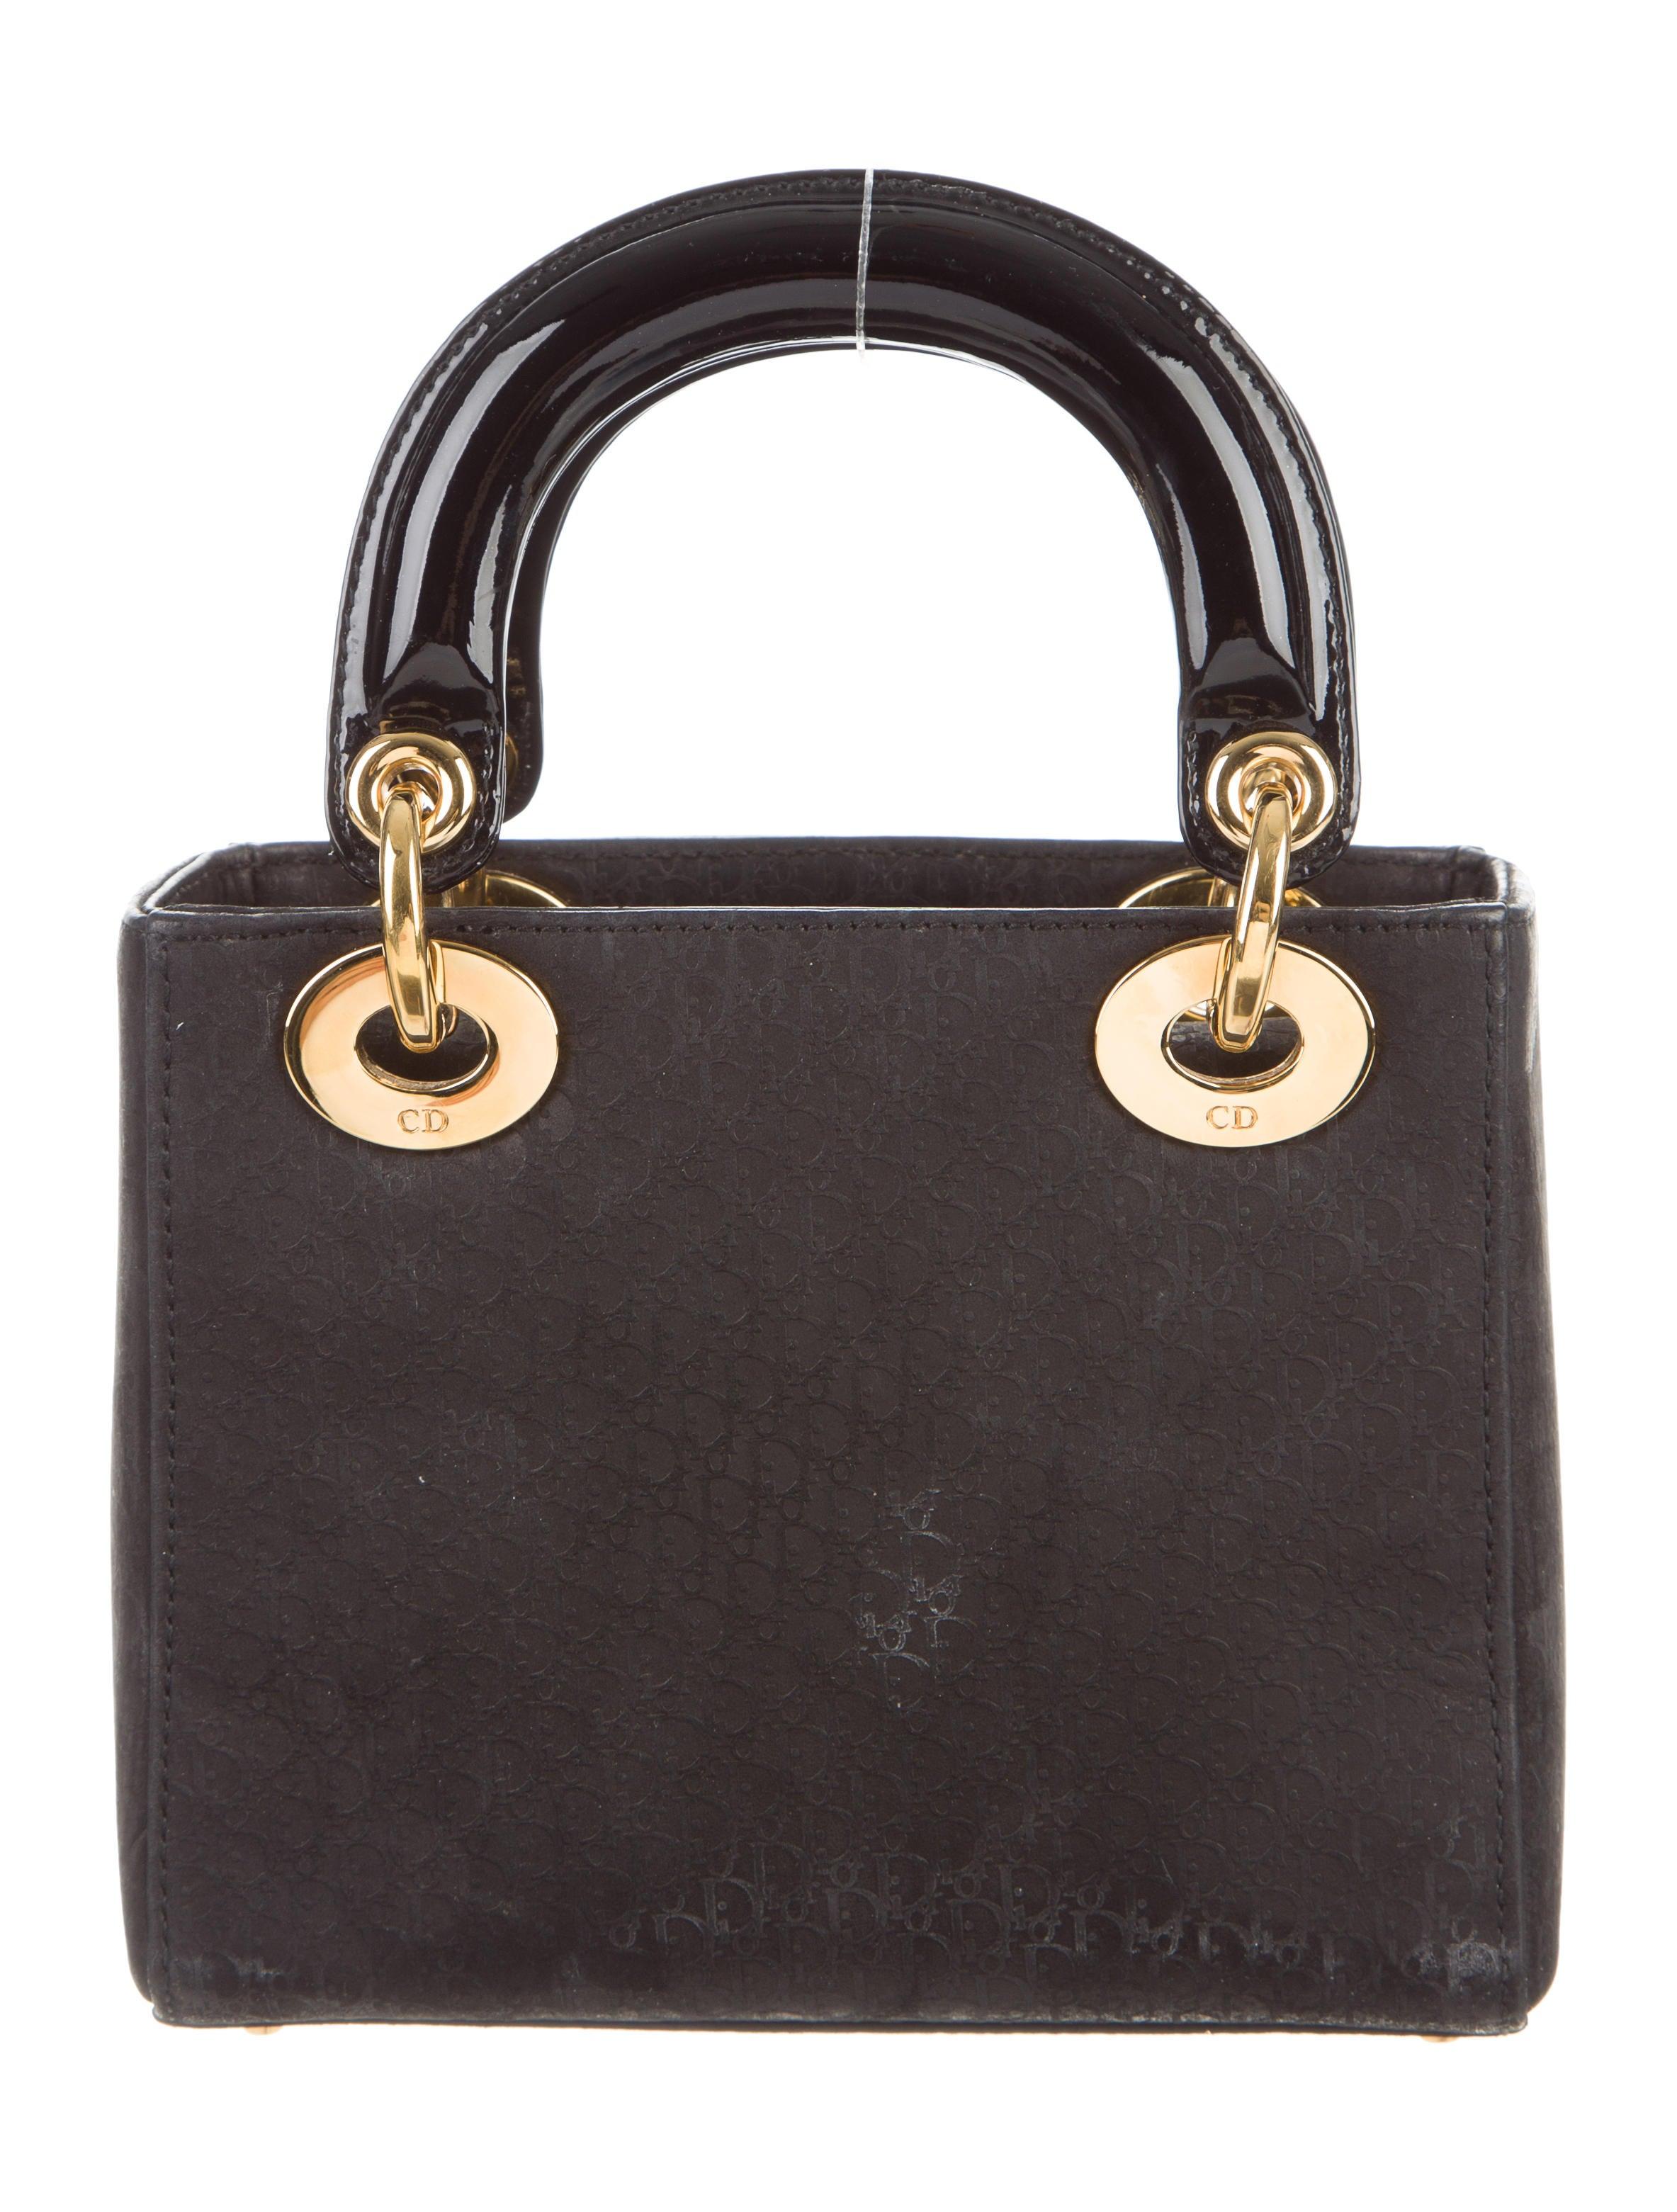 christian dior mini lady dior bag handbags chr53499 the realreal. Black Bedroom Furniture Sets. Home Design Ideas